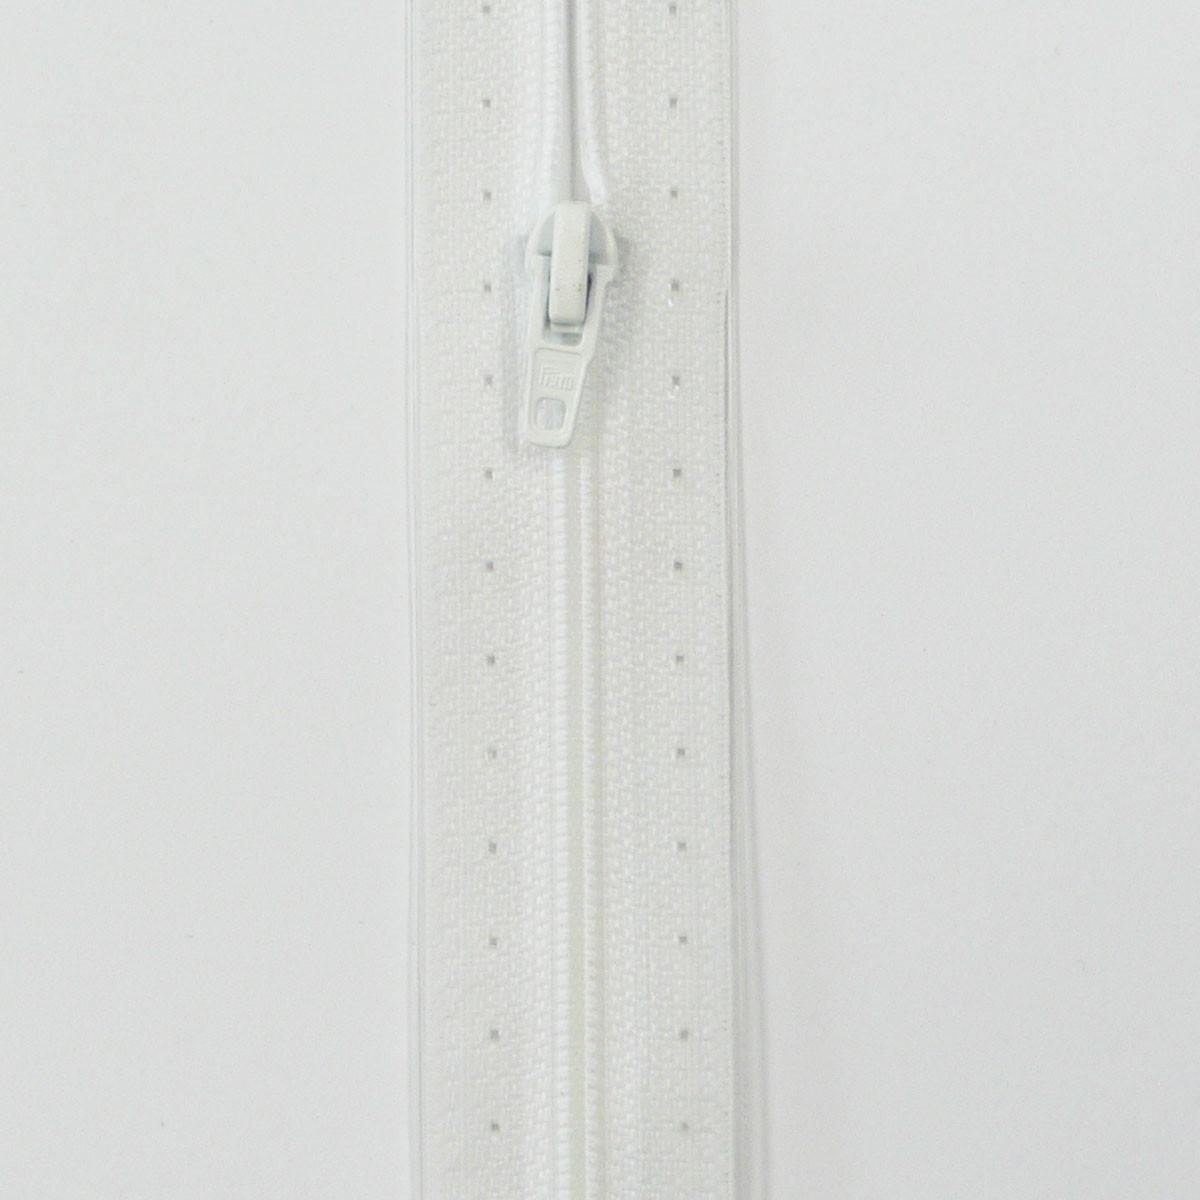 RV S1 Typ 0 ut 20 cm Fla weiß